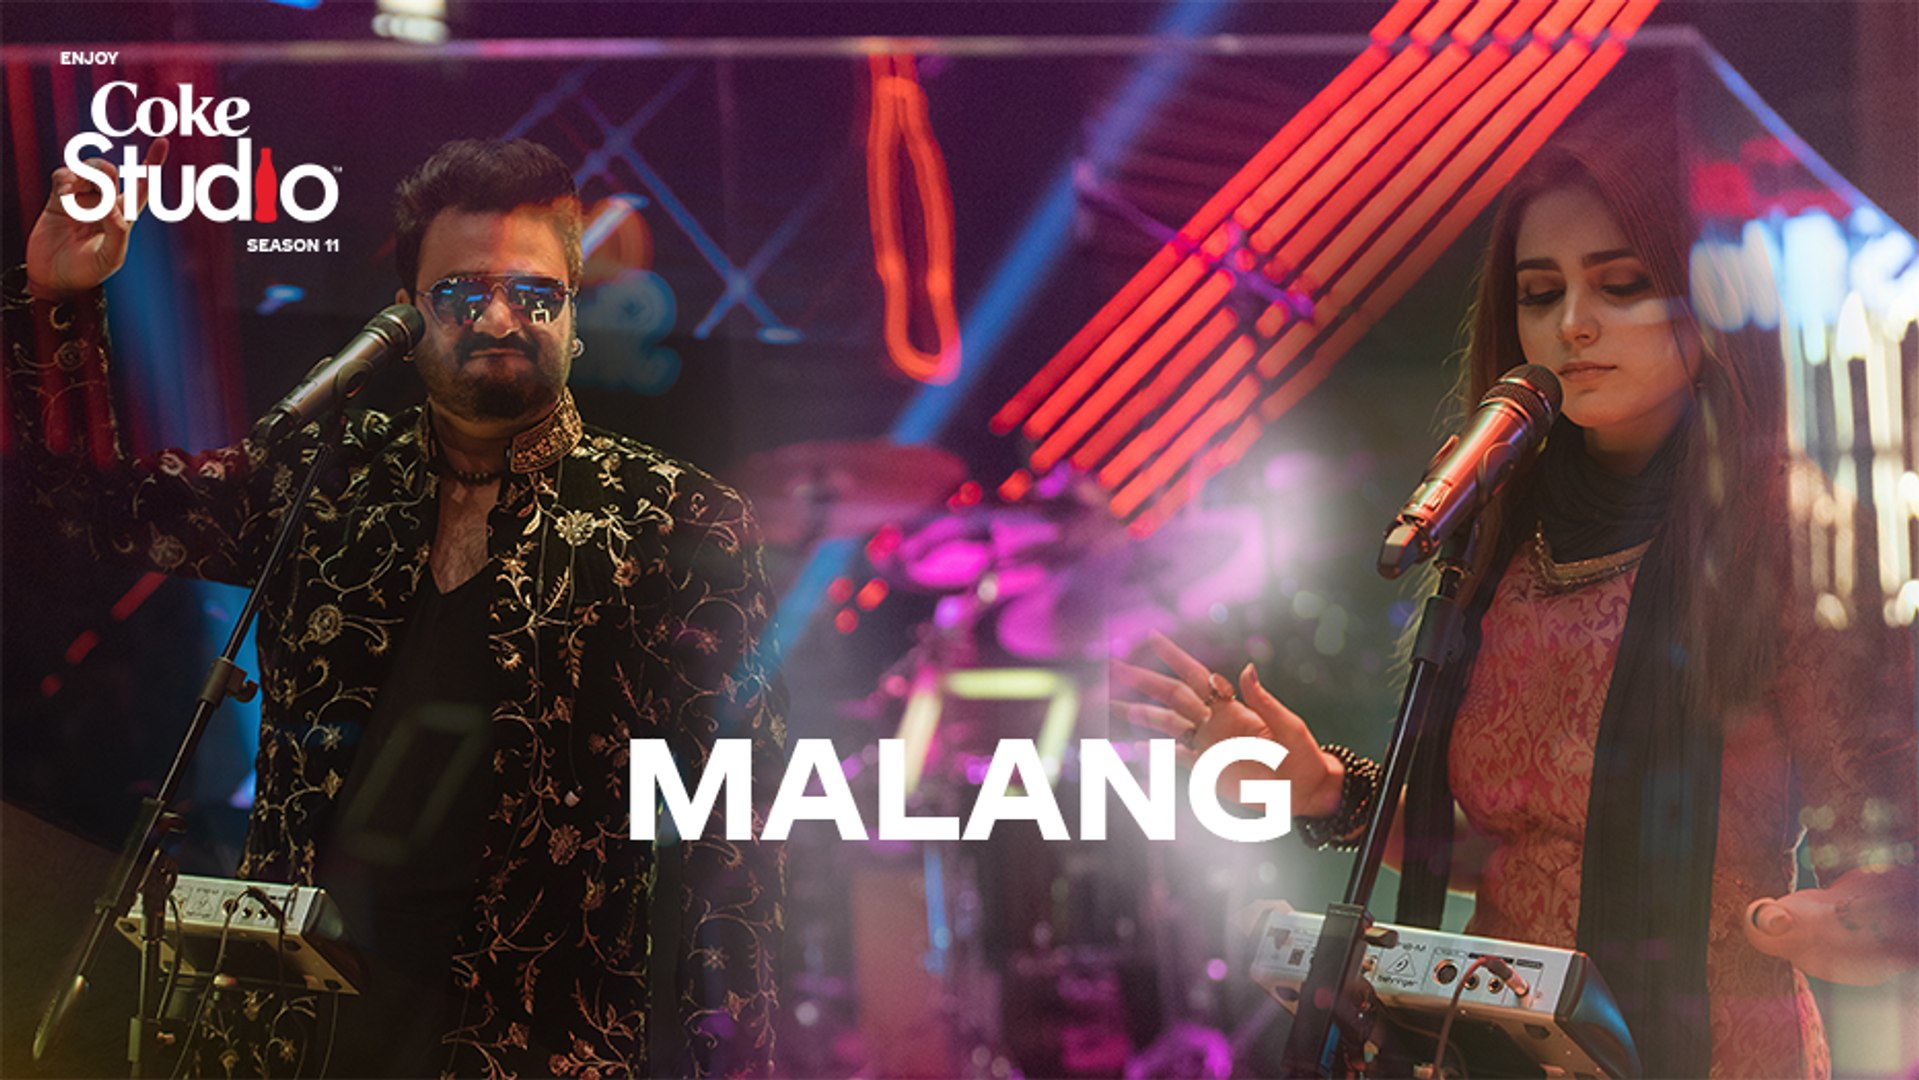 Malang Sahir Ali Bagga And Aima Baig Coke Studio Season 11 Episode 5 Video Dailymotion